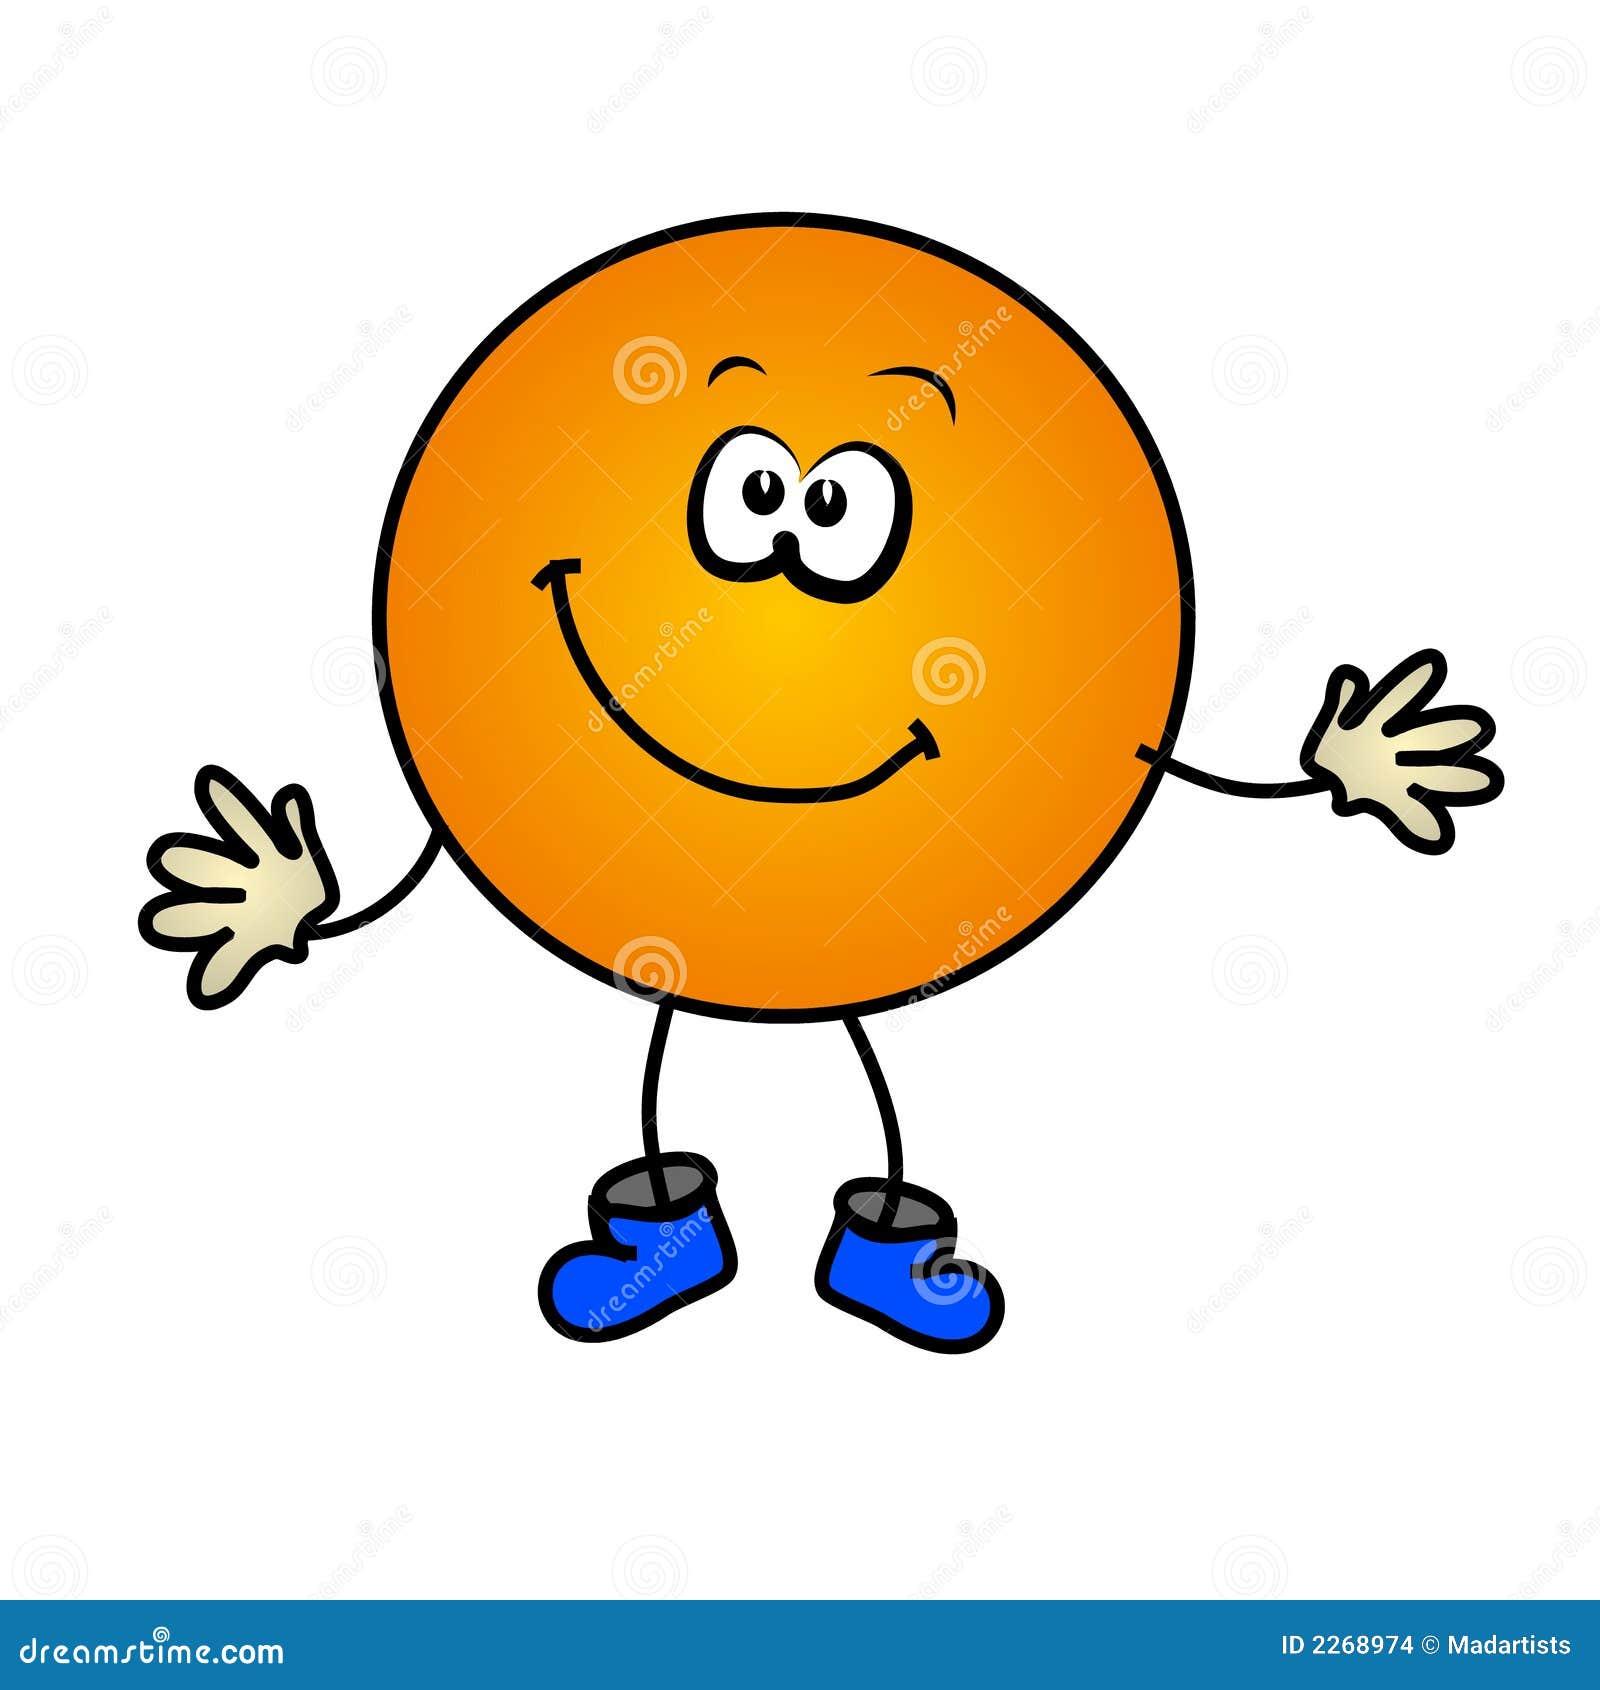 happy cartoon smiley face stock illustration illustration of circle rh dreamstime com happy cartoon face pics happy cartoon face vector free